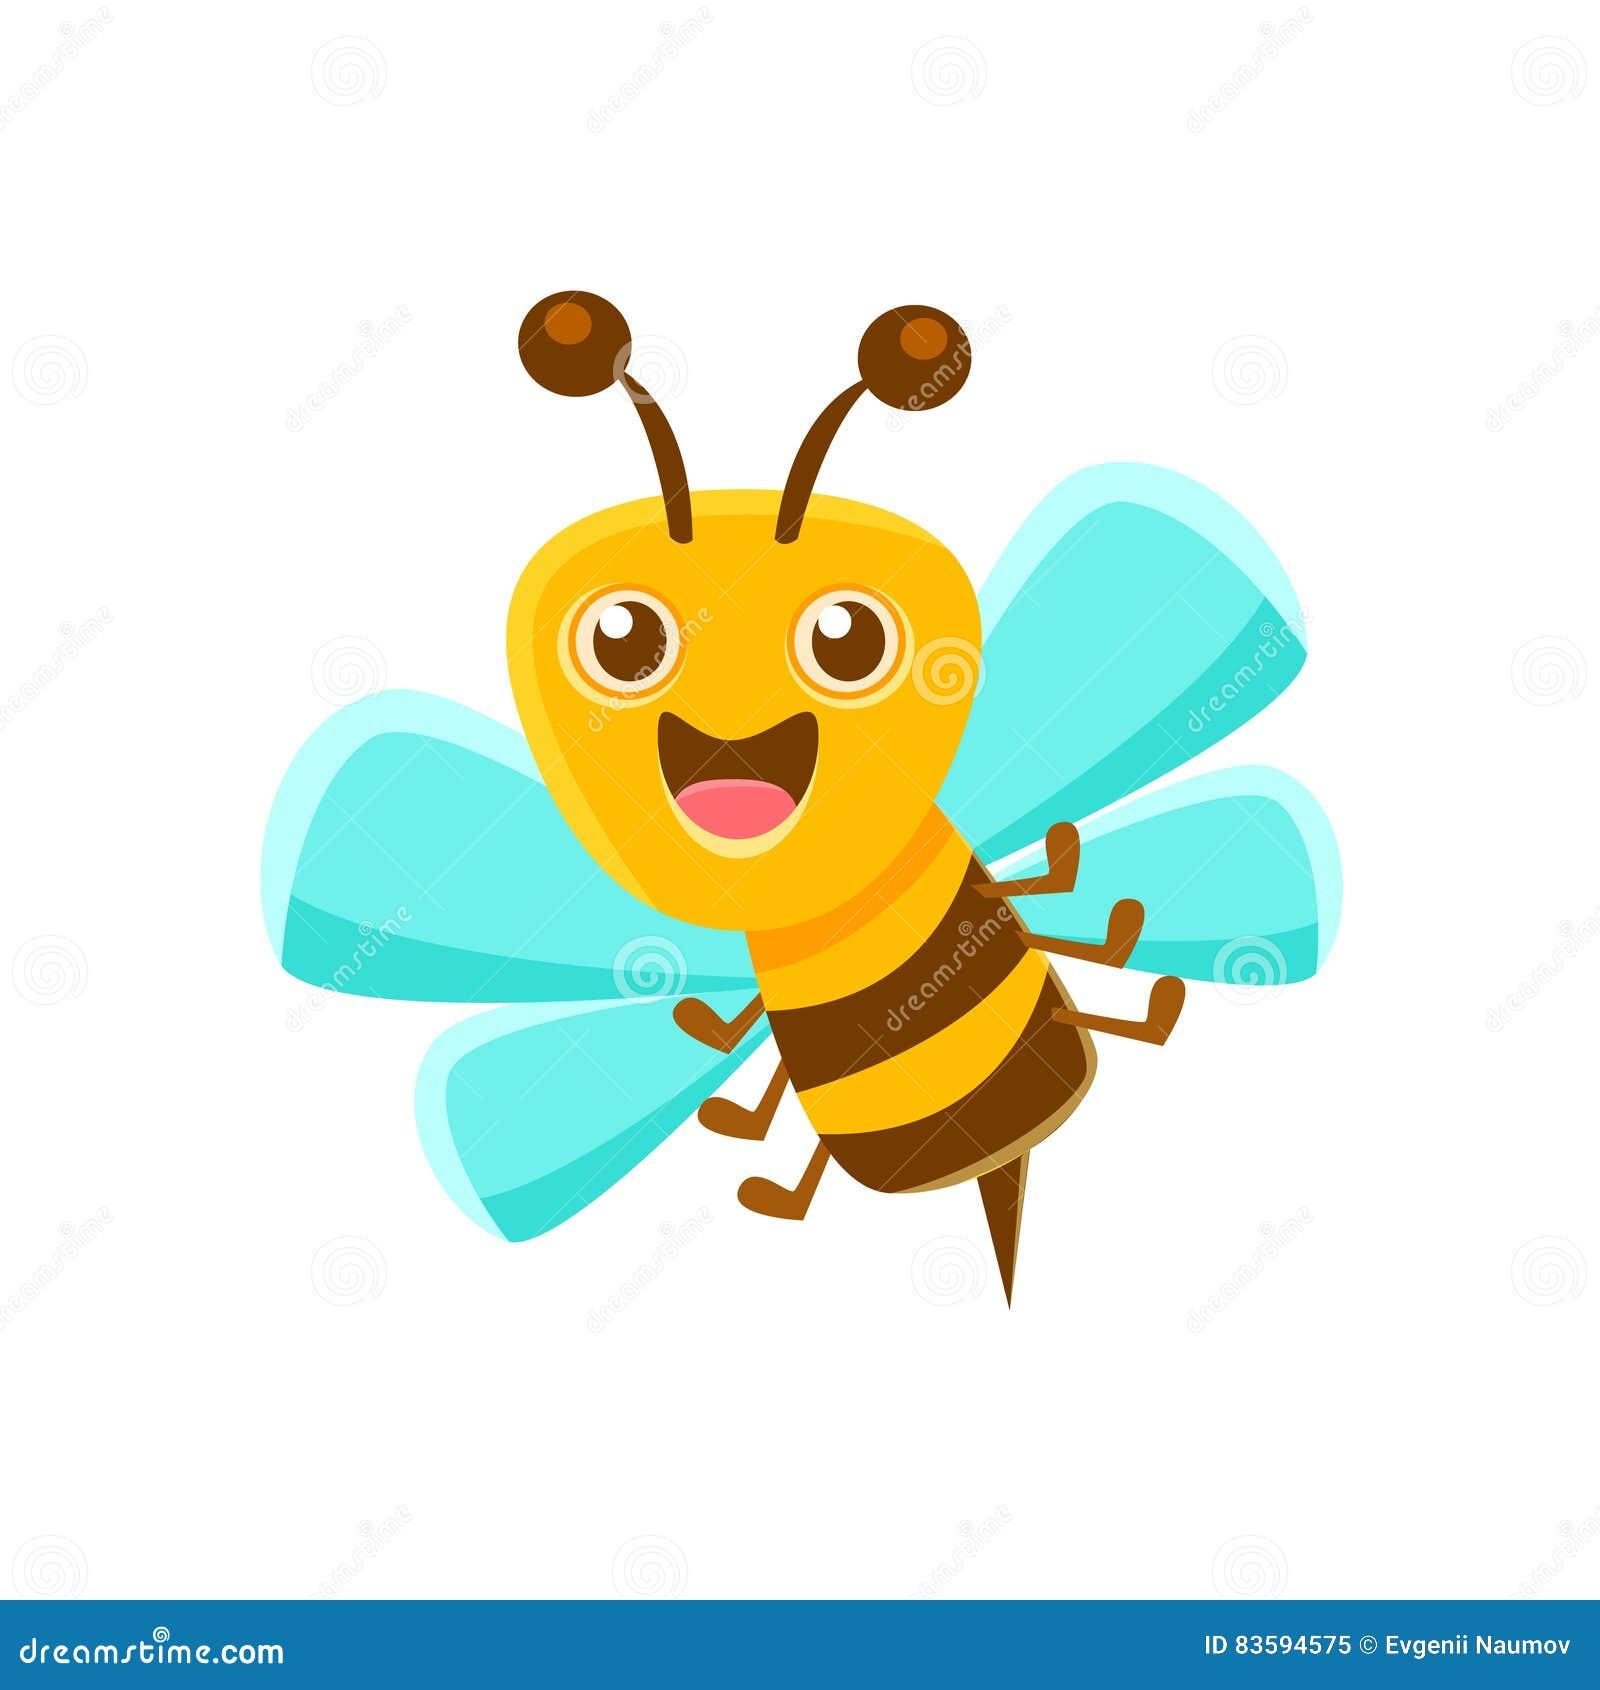 Abeja feliz Mid Air con Sting, Honey Production Related Carton Illustration natural